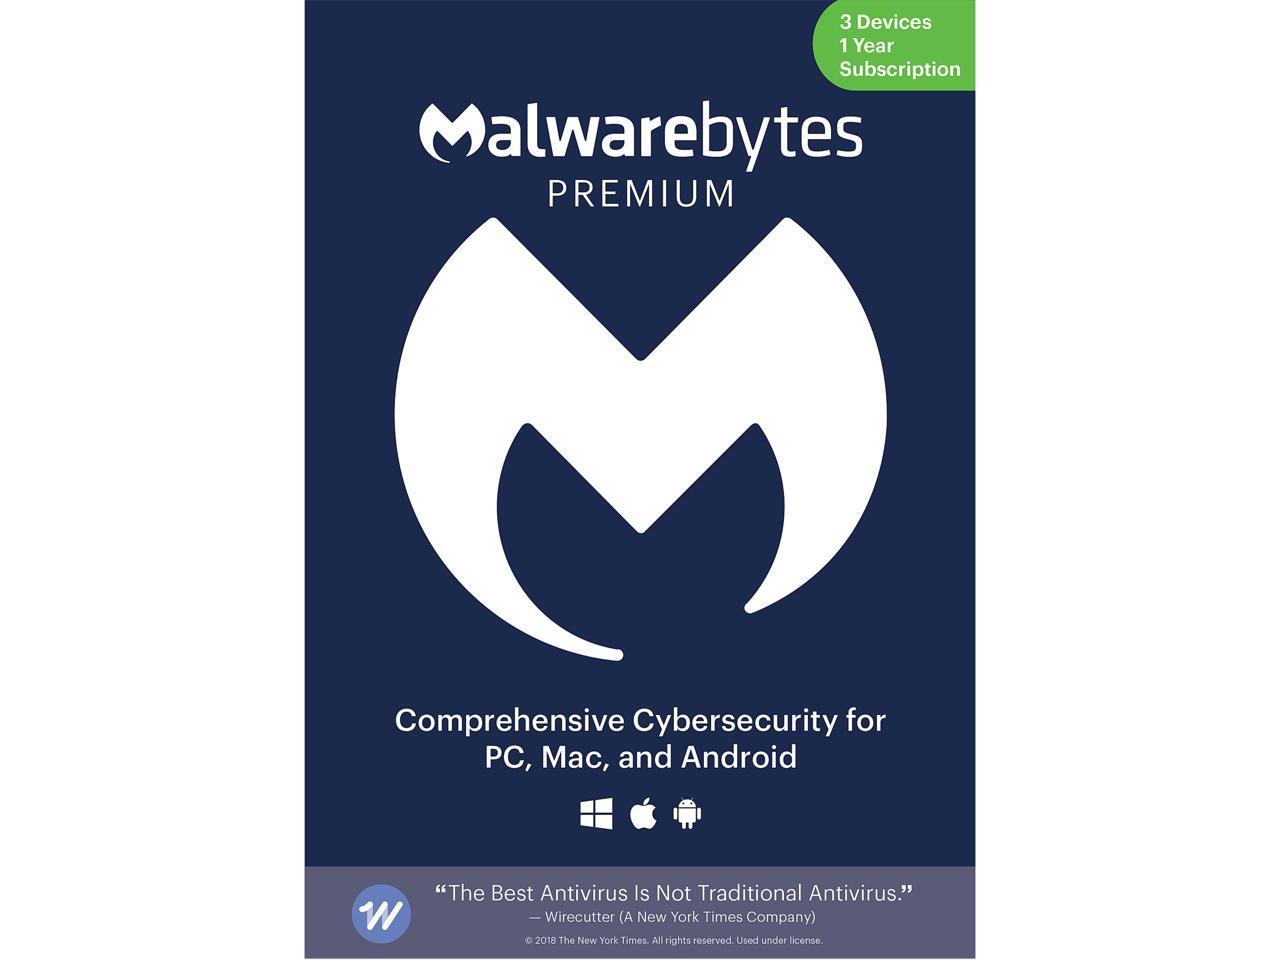 Malwarebytes Anti-Malware Premium 4.0 (3 Device/1-Year) DL | Key Card@Newegg $20